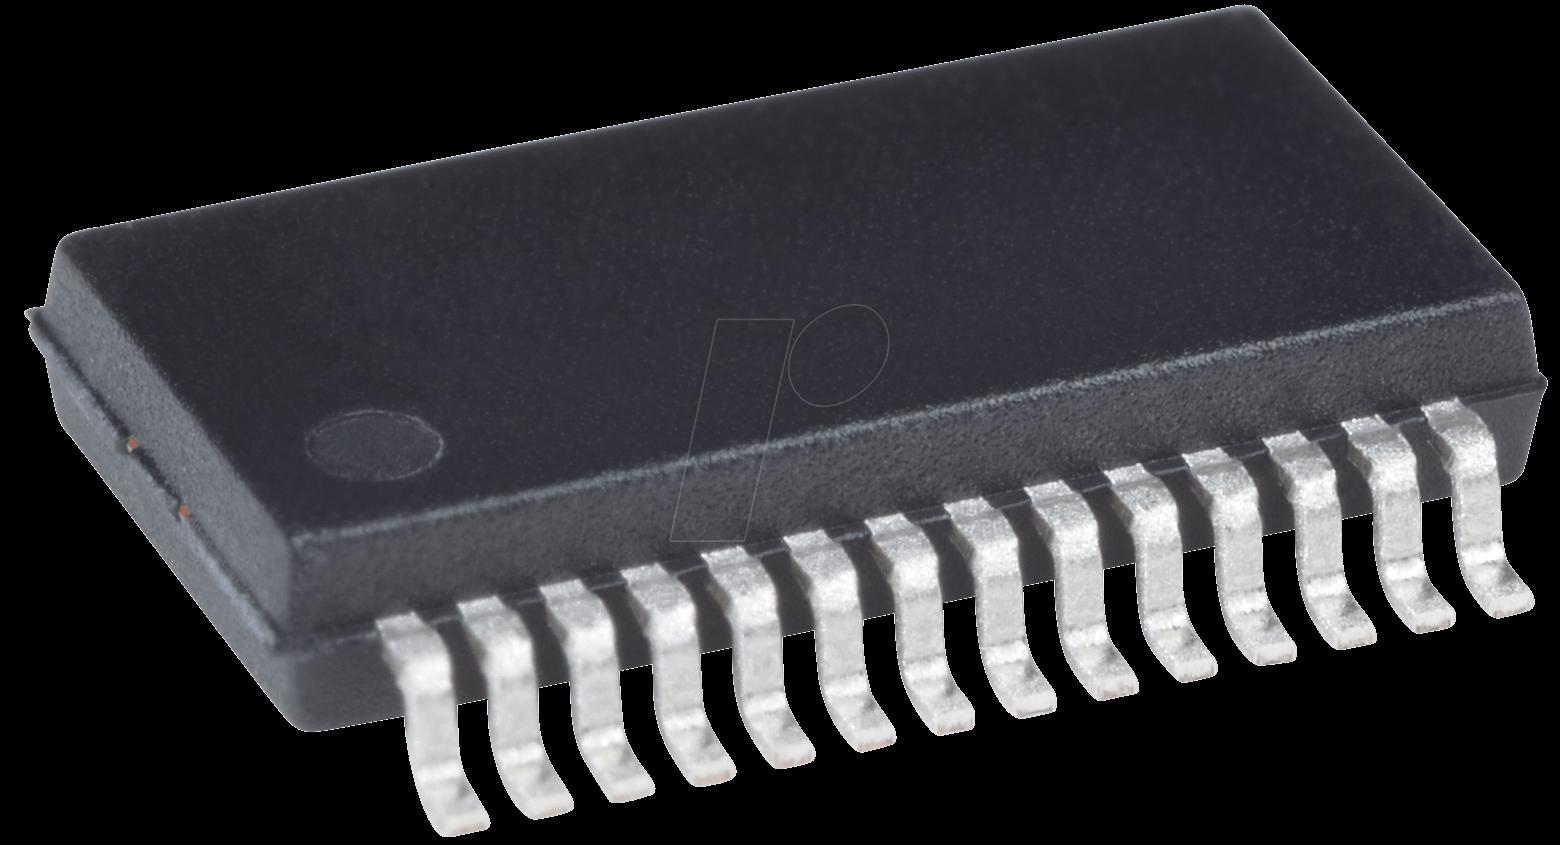 Ad 5421 Brez D A Converter Ic 16 Bit Tssop 28 At Reichelt Elektronik Circuit Adconverter Addaconvertercircuit Analog Devices Ad5421brez Item No